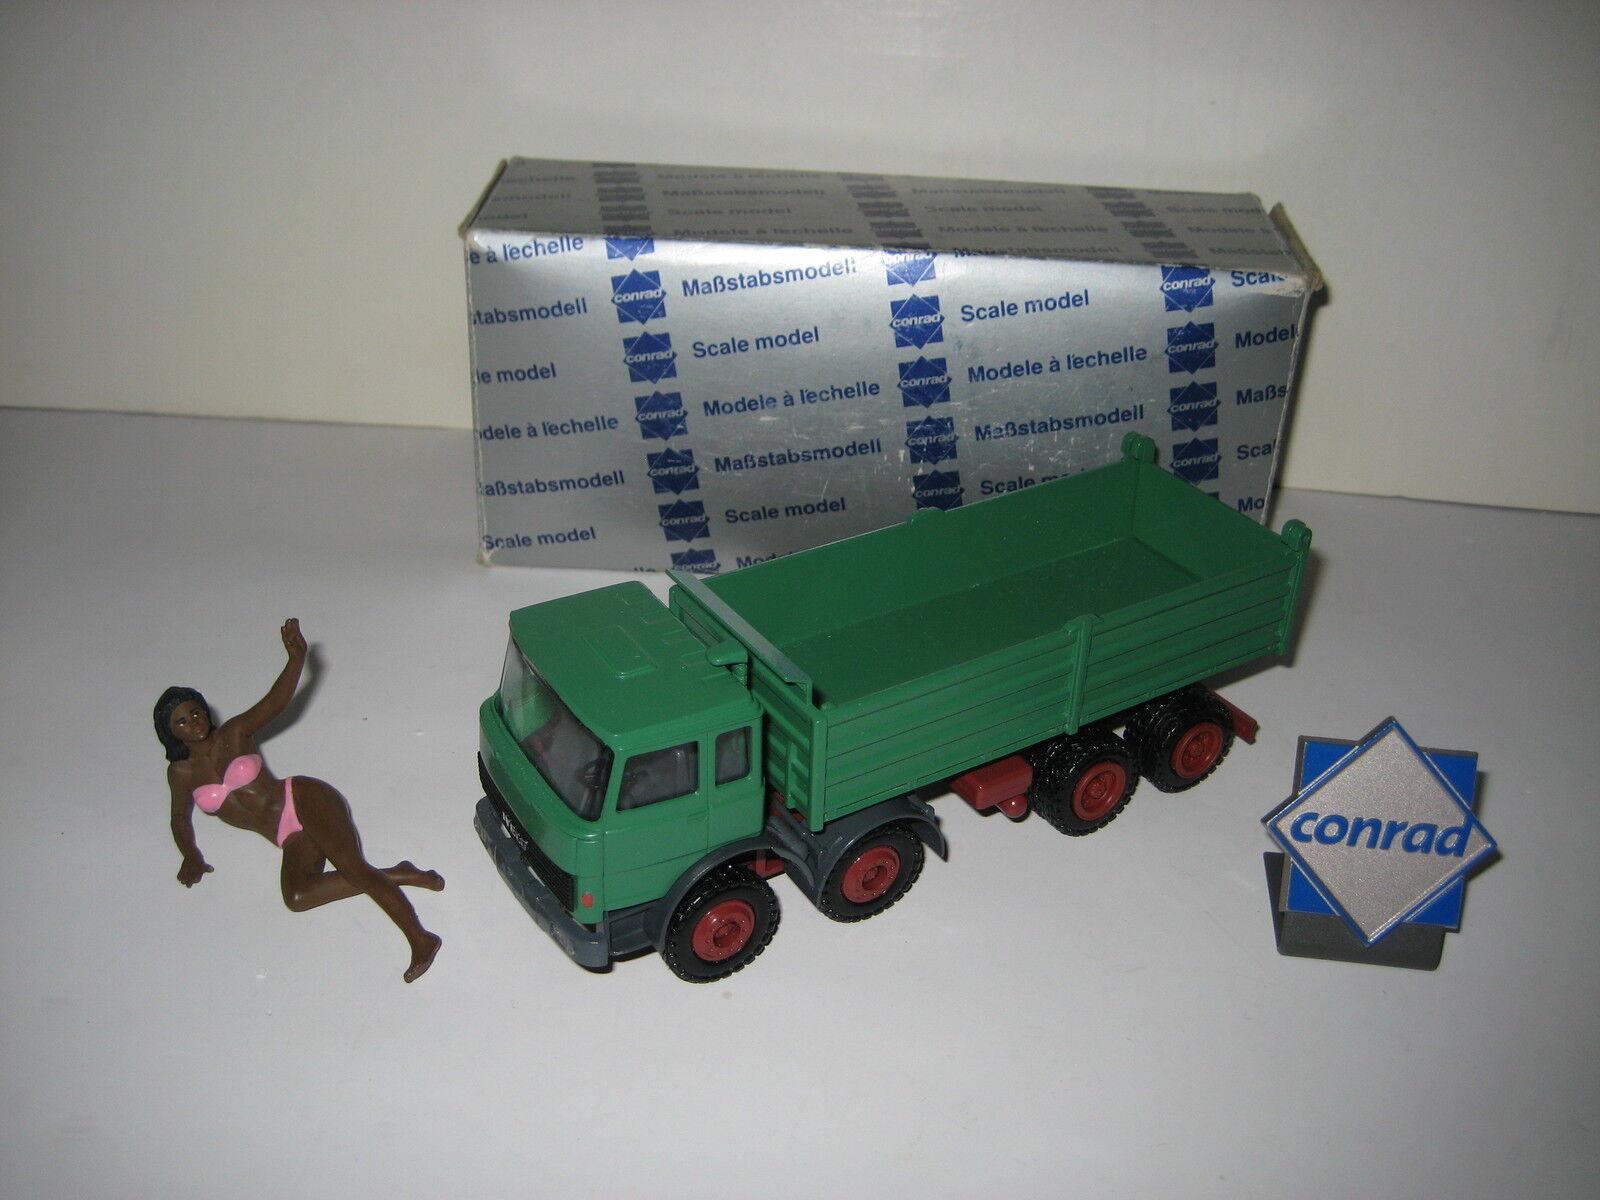 Iveco 4-alineación kipper verde  5274.2 Conrad 1 50 50 50 OVP 04a161